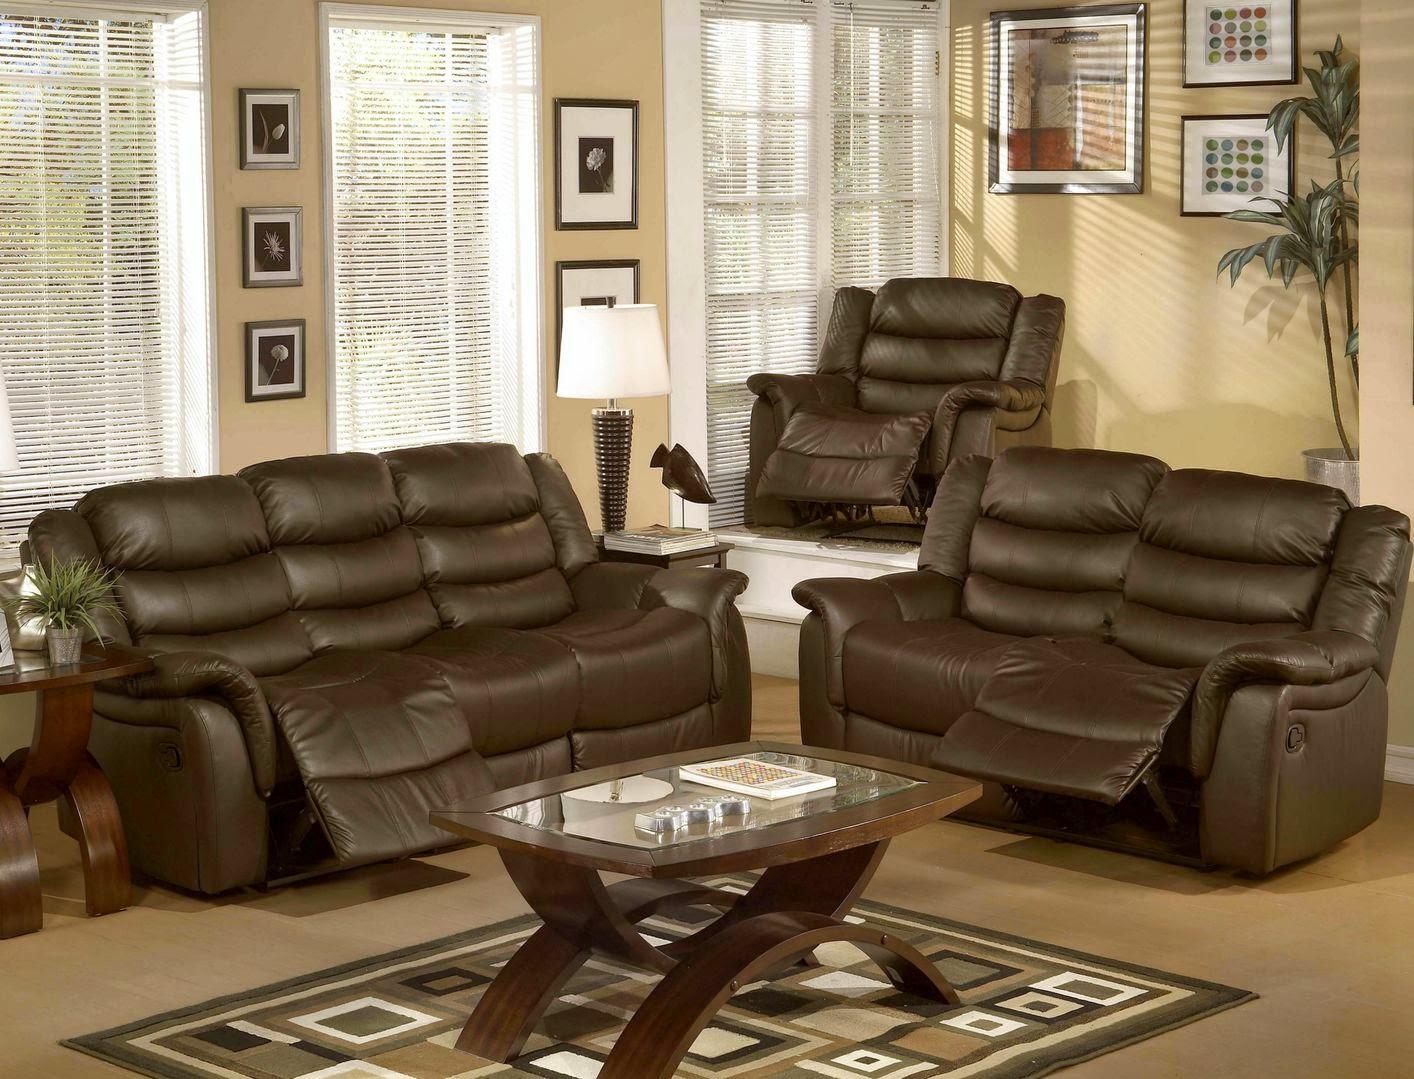 sofa ideas rh thatsimplygirl blogspot com